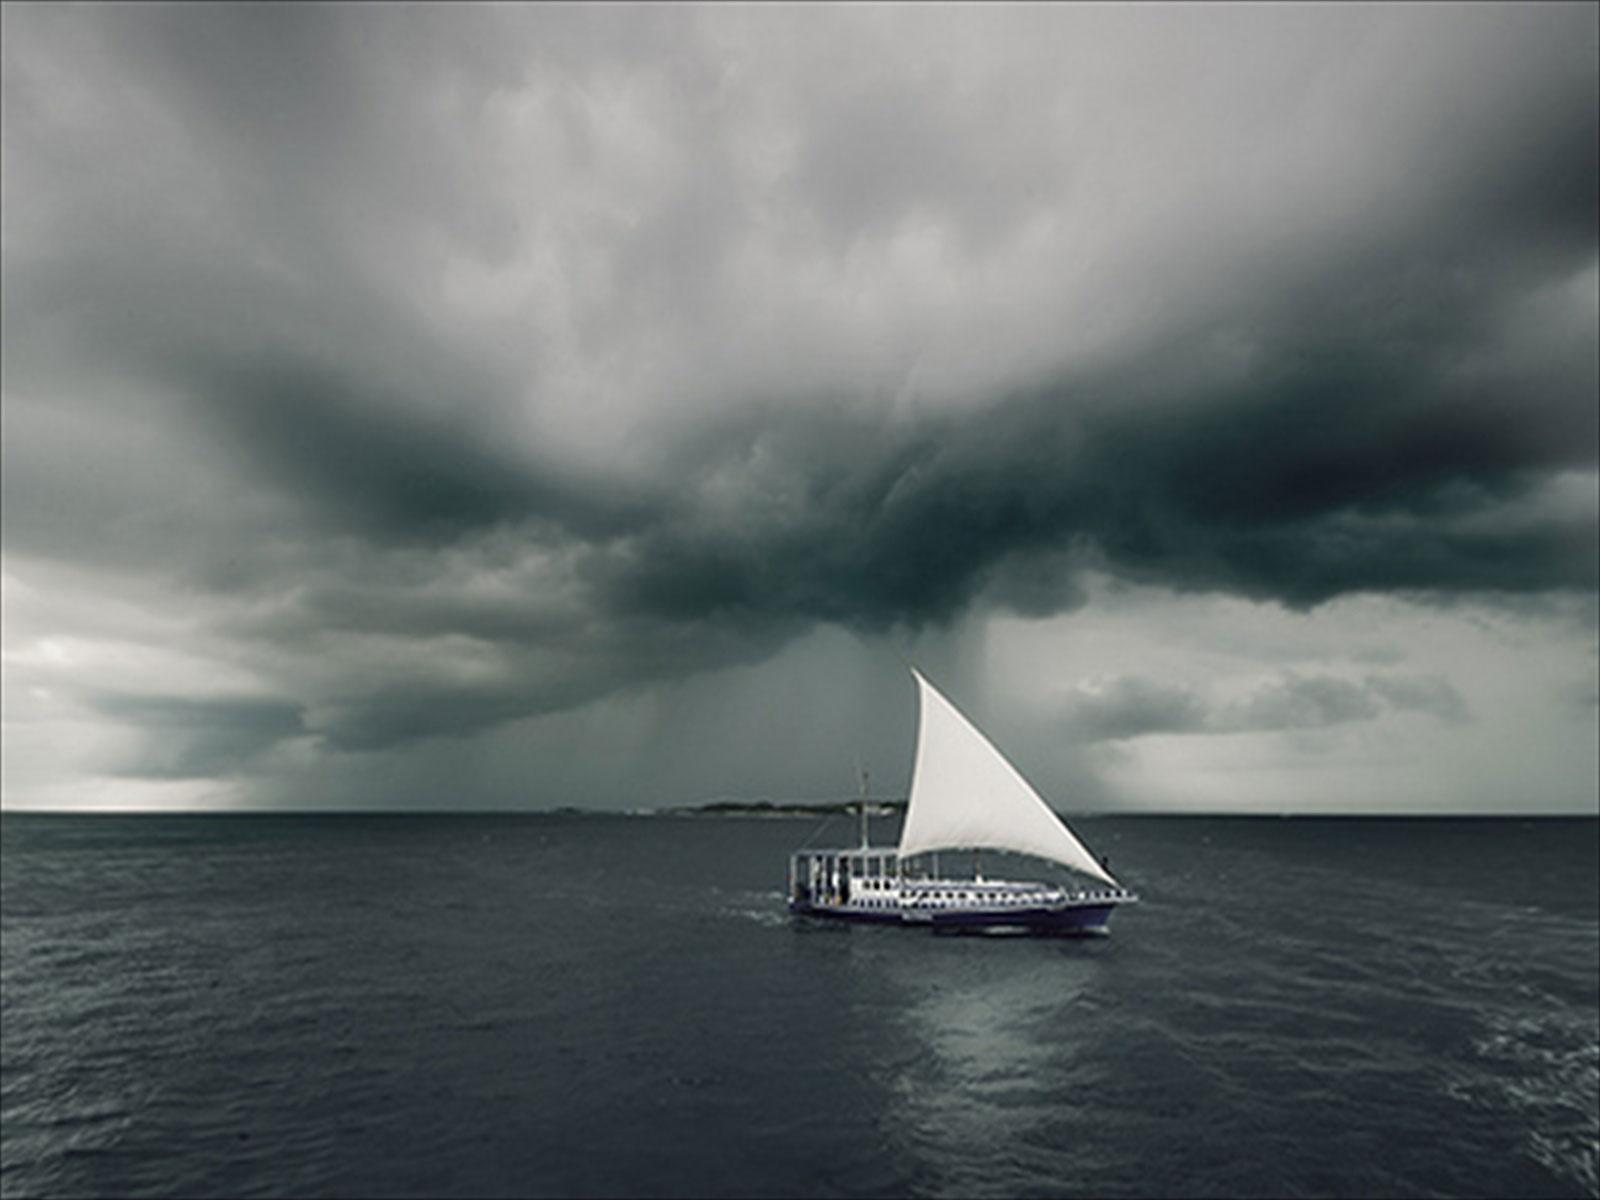 https://2.bp.blogspot.com/-53y_jKh-JLU/T-ln51_XEwI/AAAAAAAAATA/WXgAR9-1Ftw/s1600/Sea-rain-wallpapers-for-des.jpg